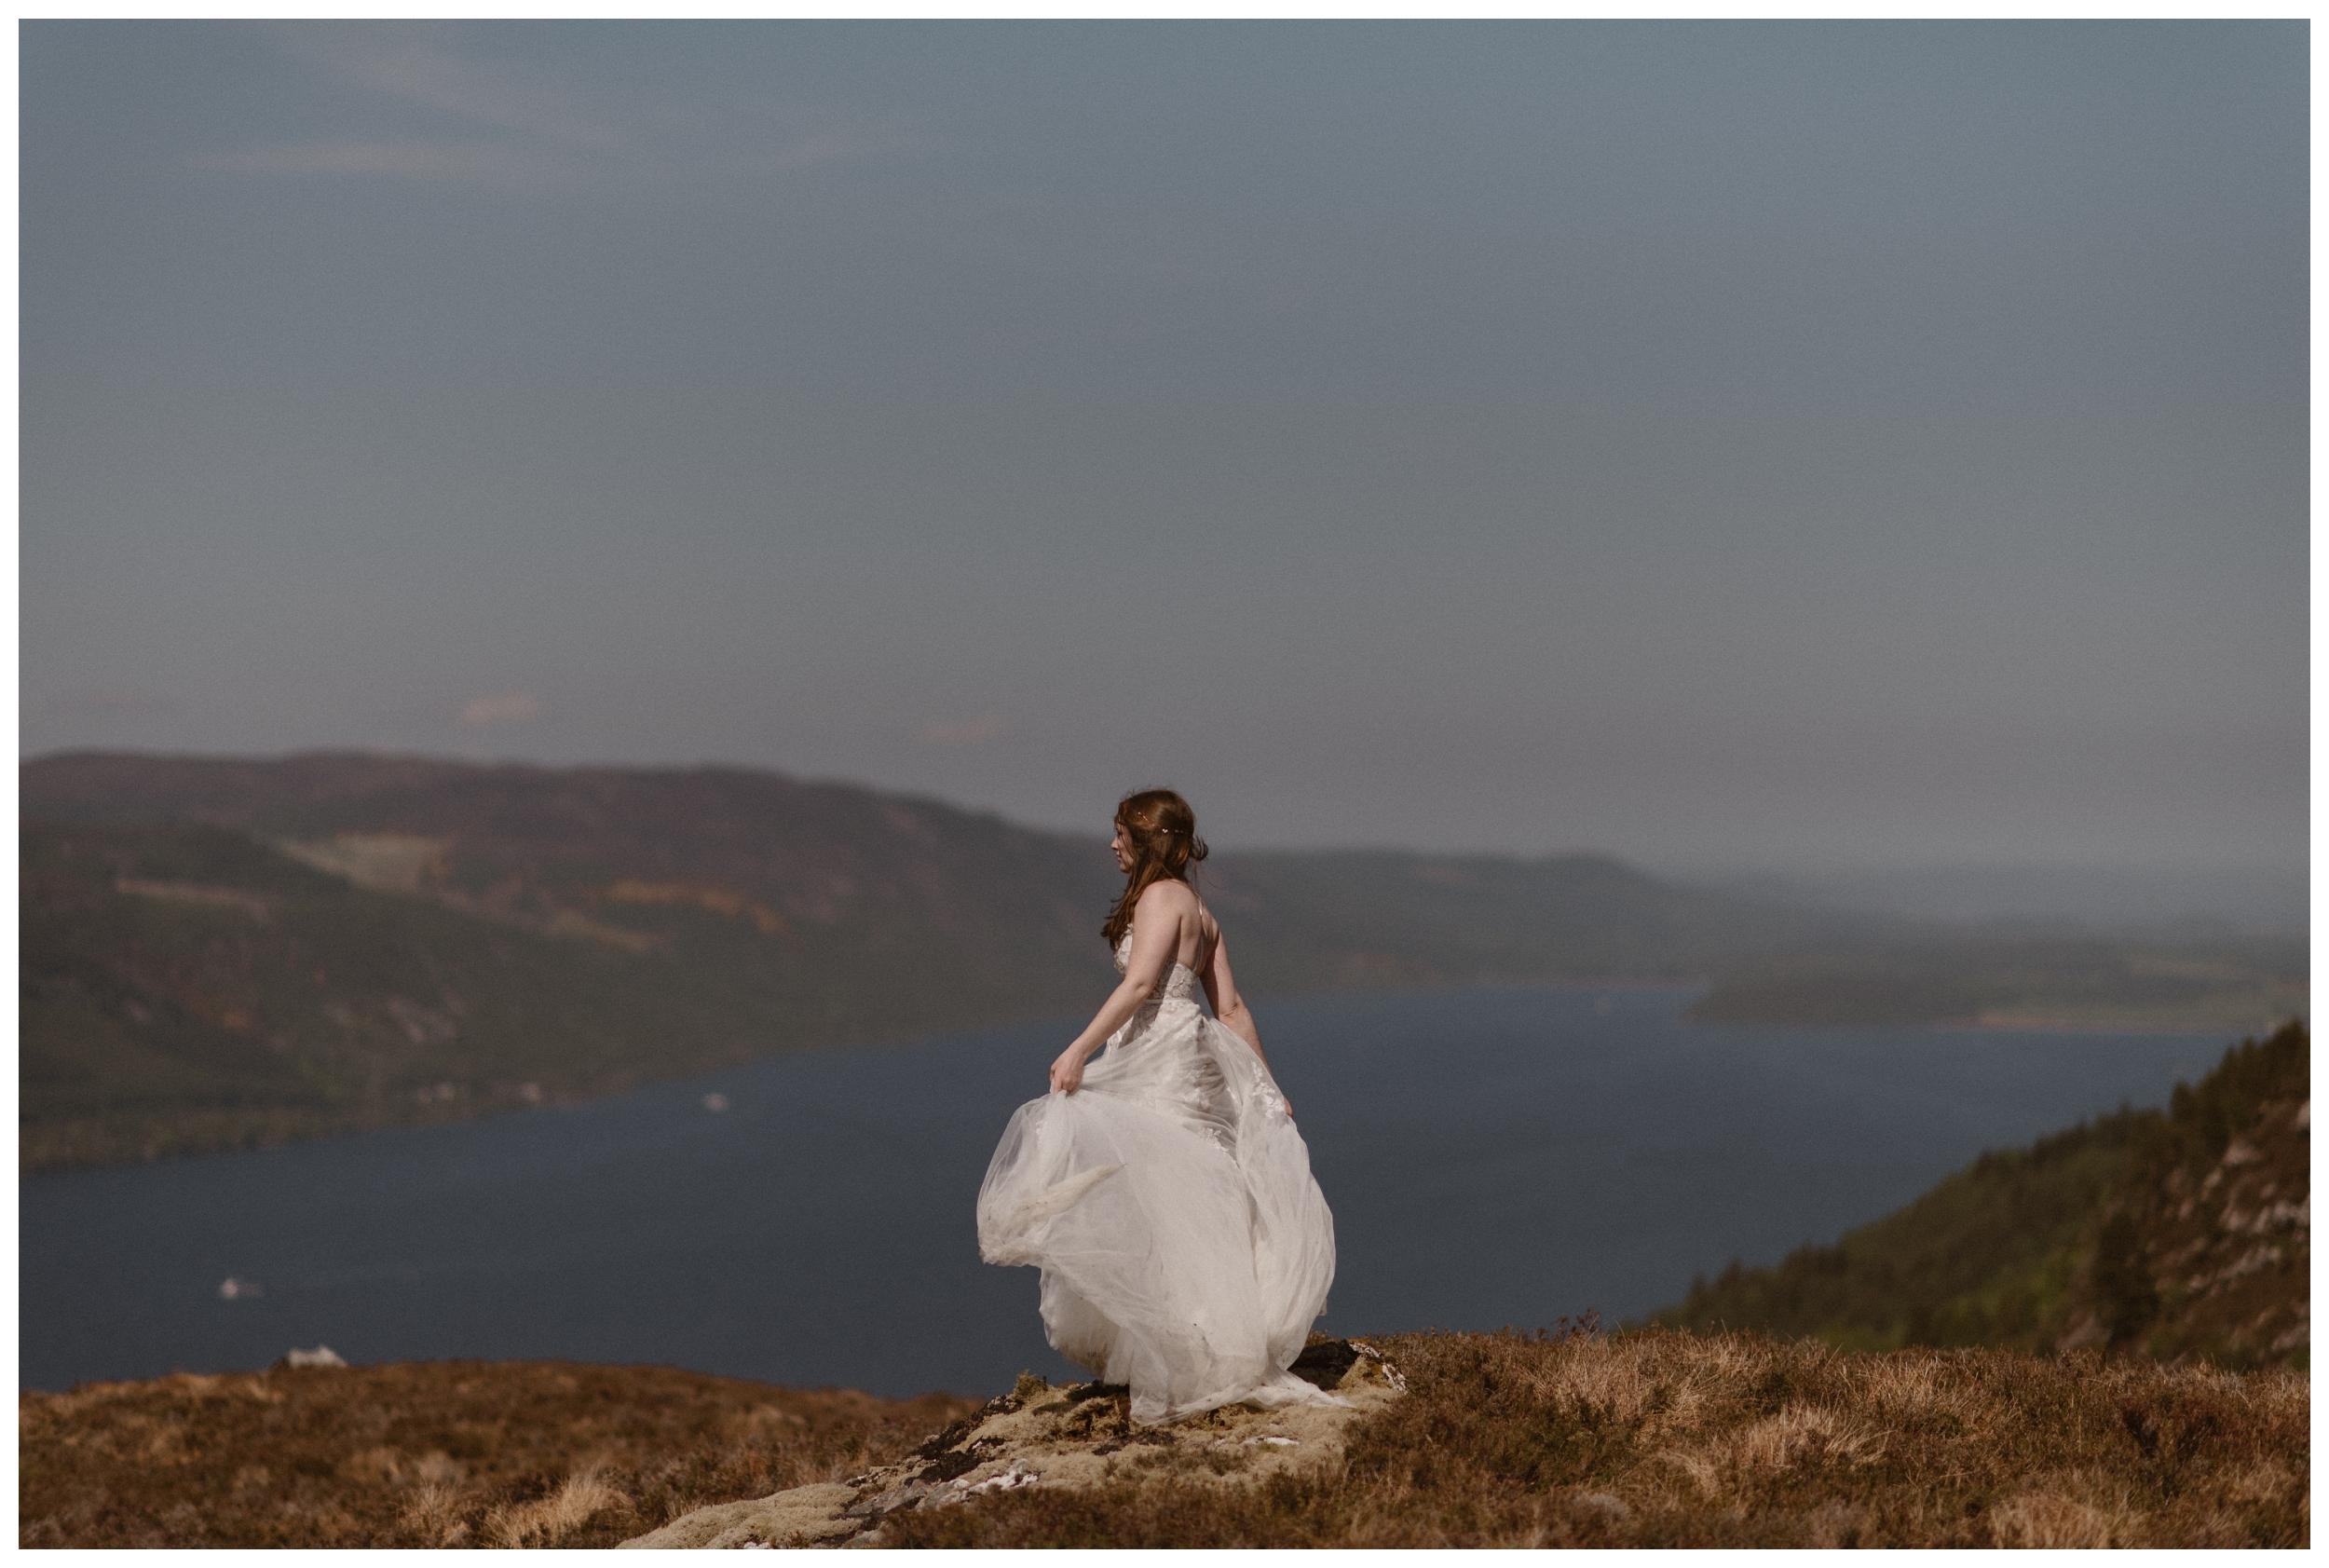 Elissa stands in her wedding dress on a ridge overlooking Loch Ness in the Scottish Highlands. Photo by Maddie Mae, Adventure Instead.